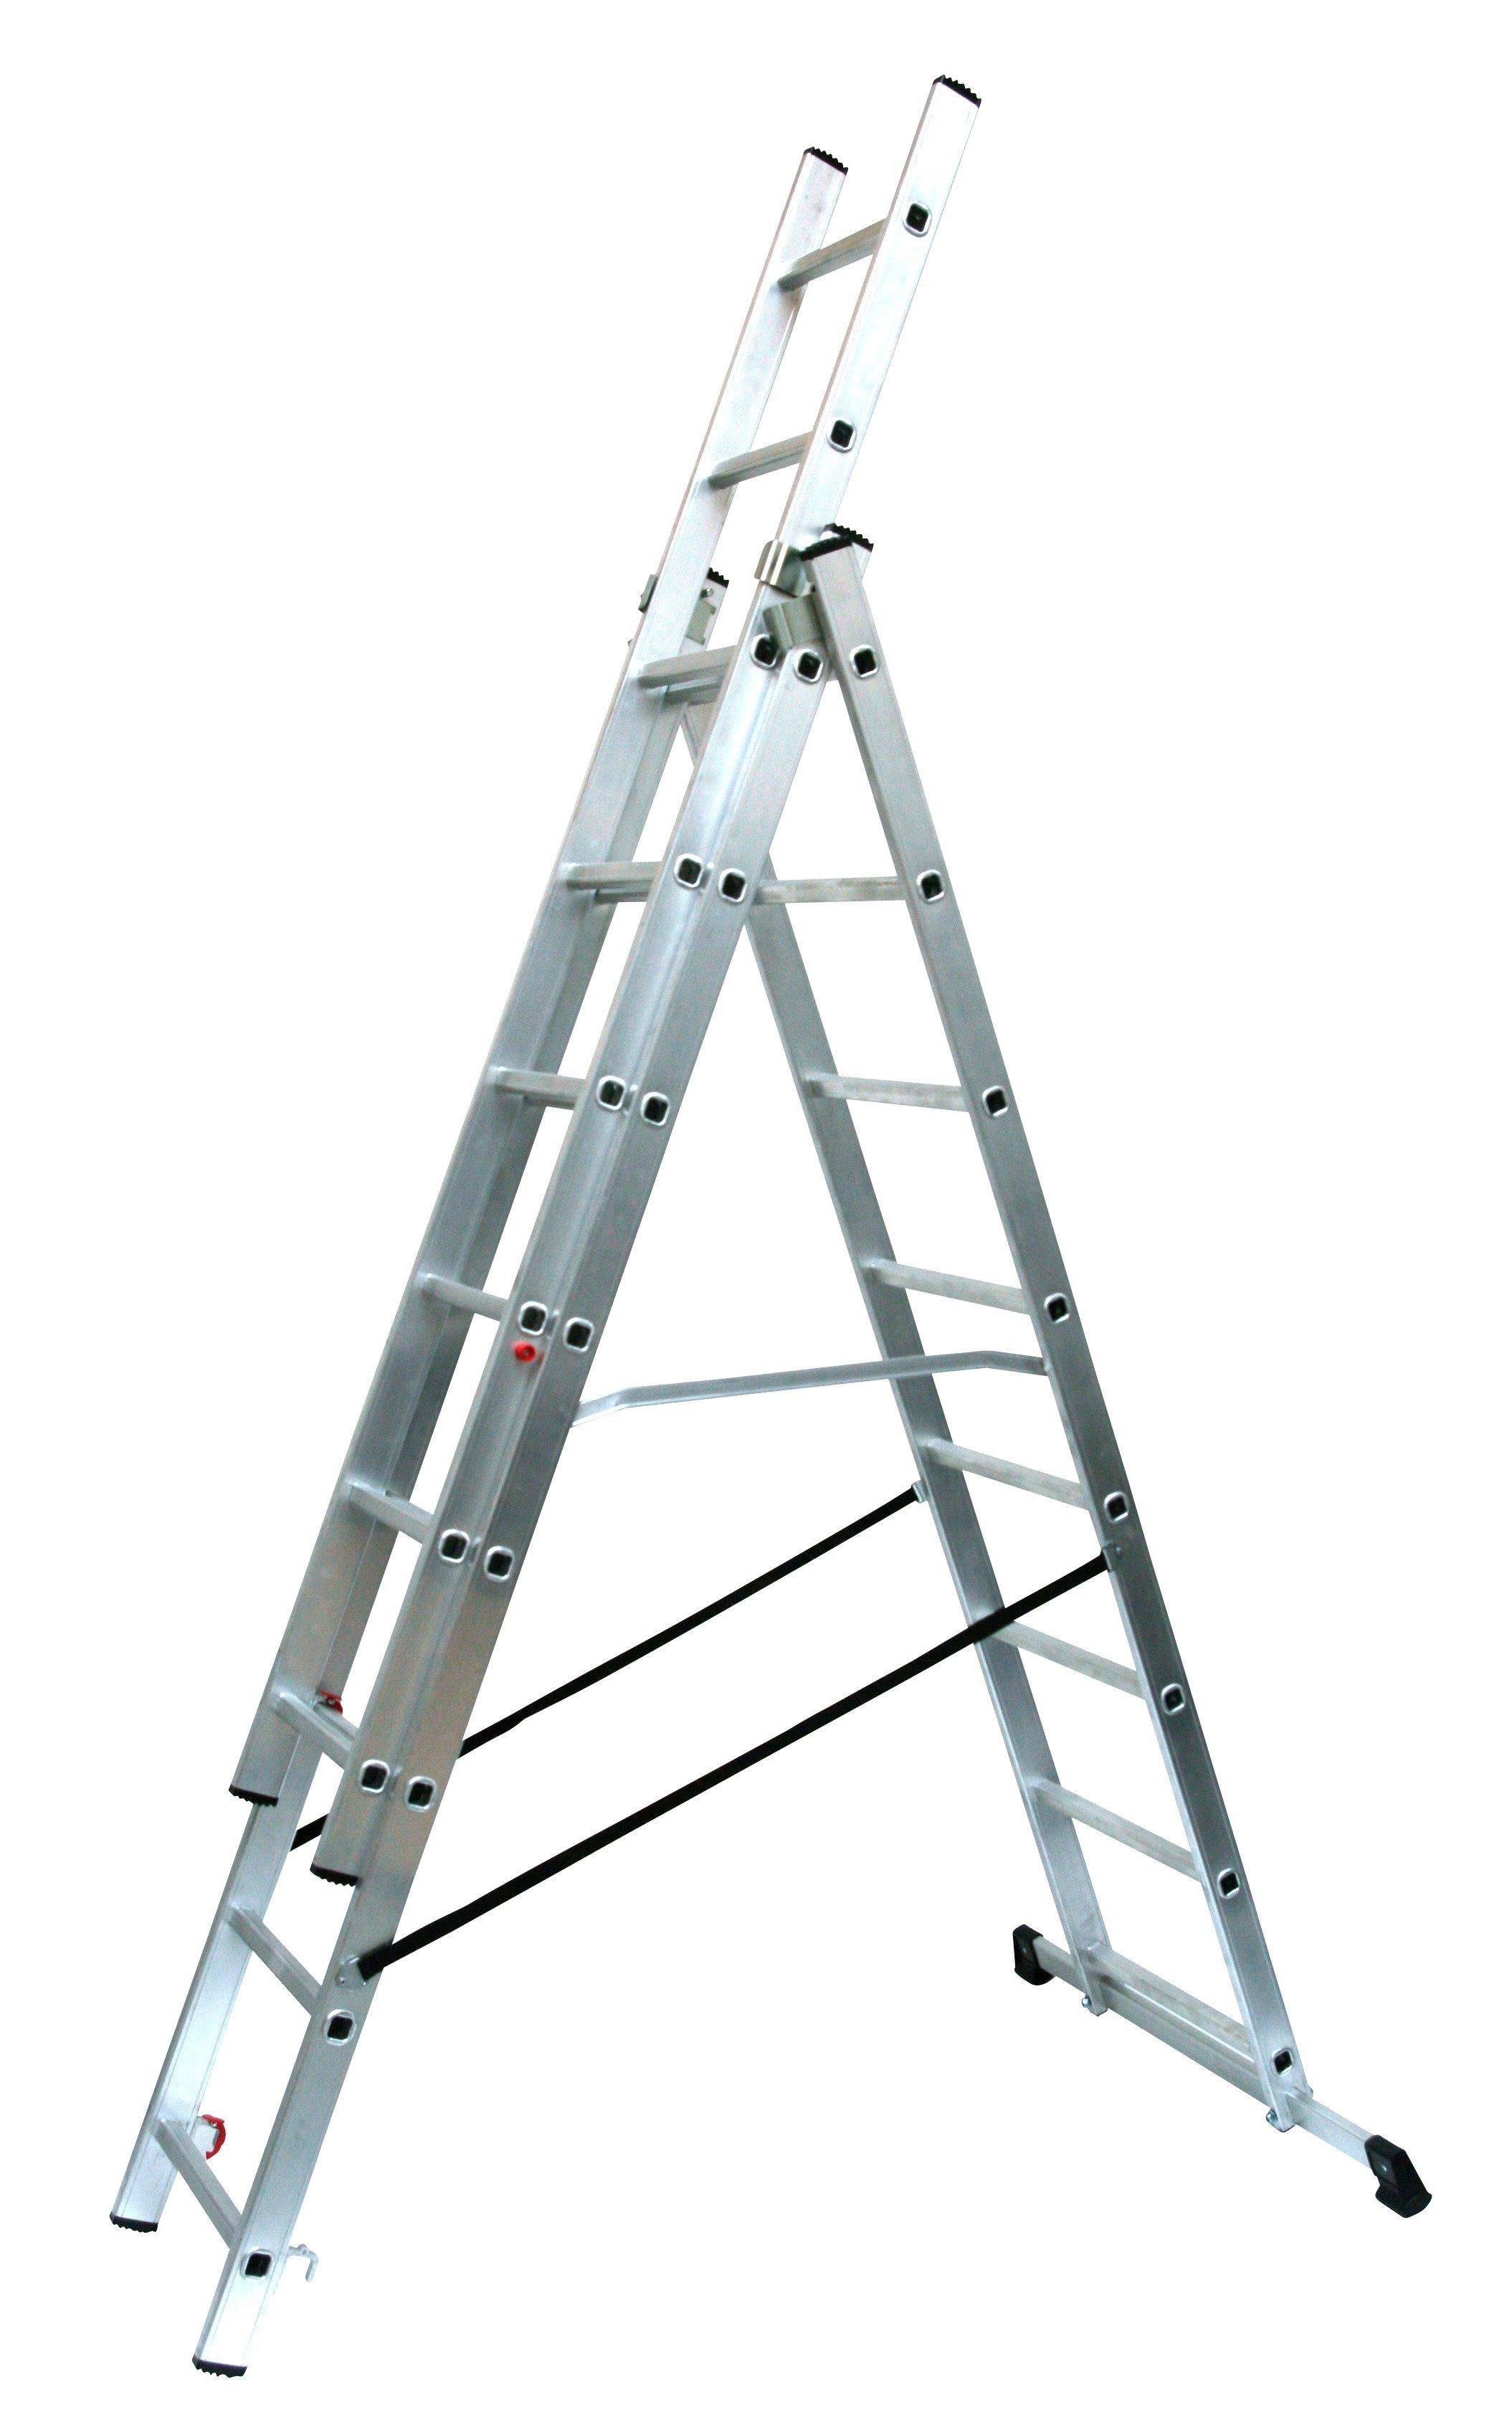 SZ METALL Alu-Schiebeleiter »8 x 3 Sprossen« | Baumarkt > Leitern und Treppen > Schiebeleiter | SZ Metall